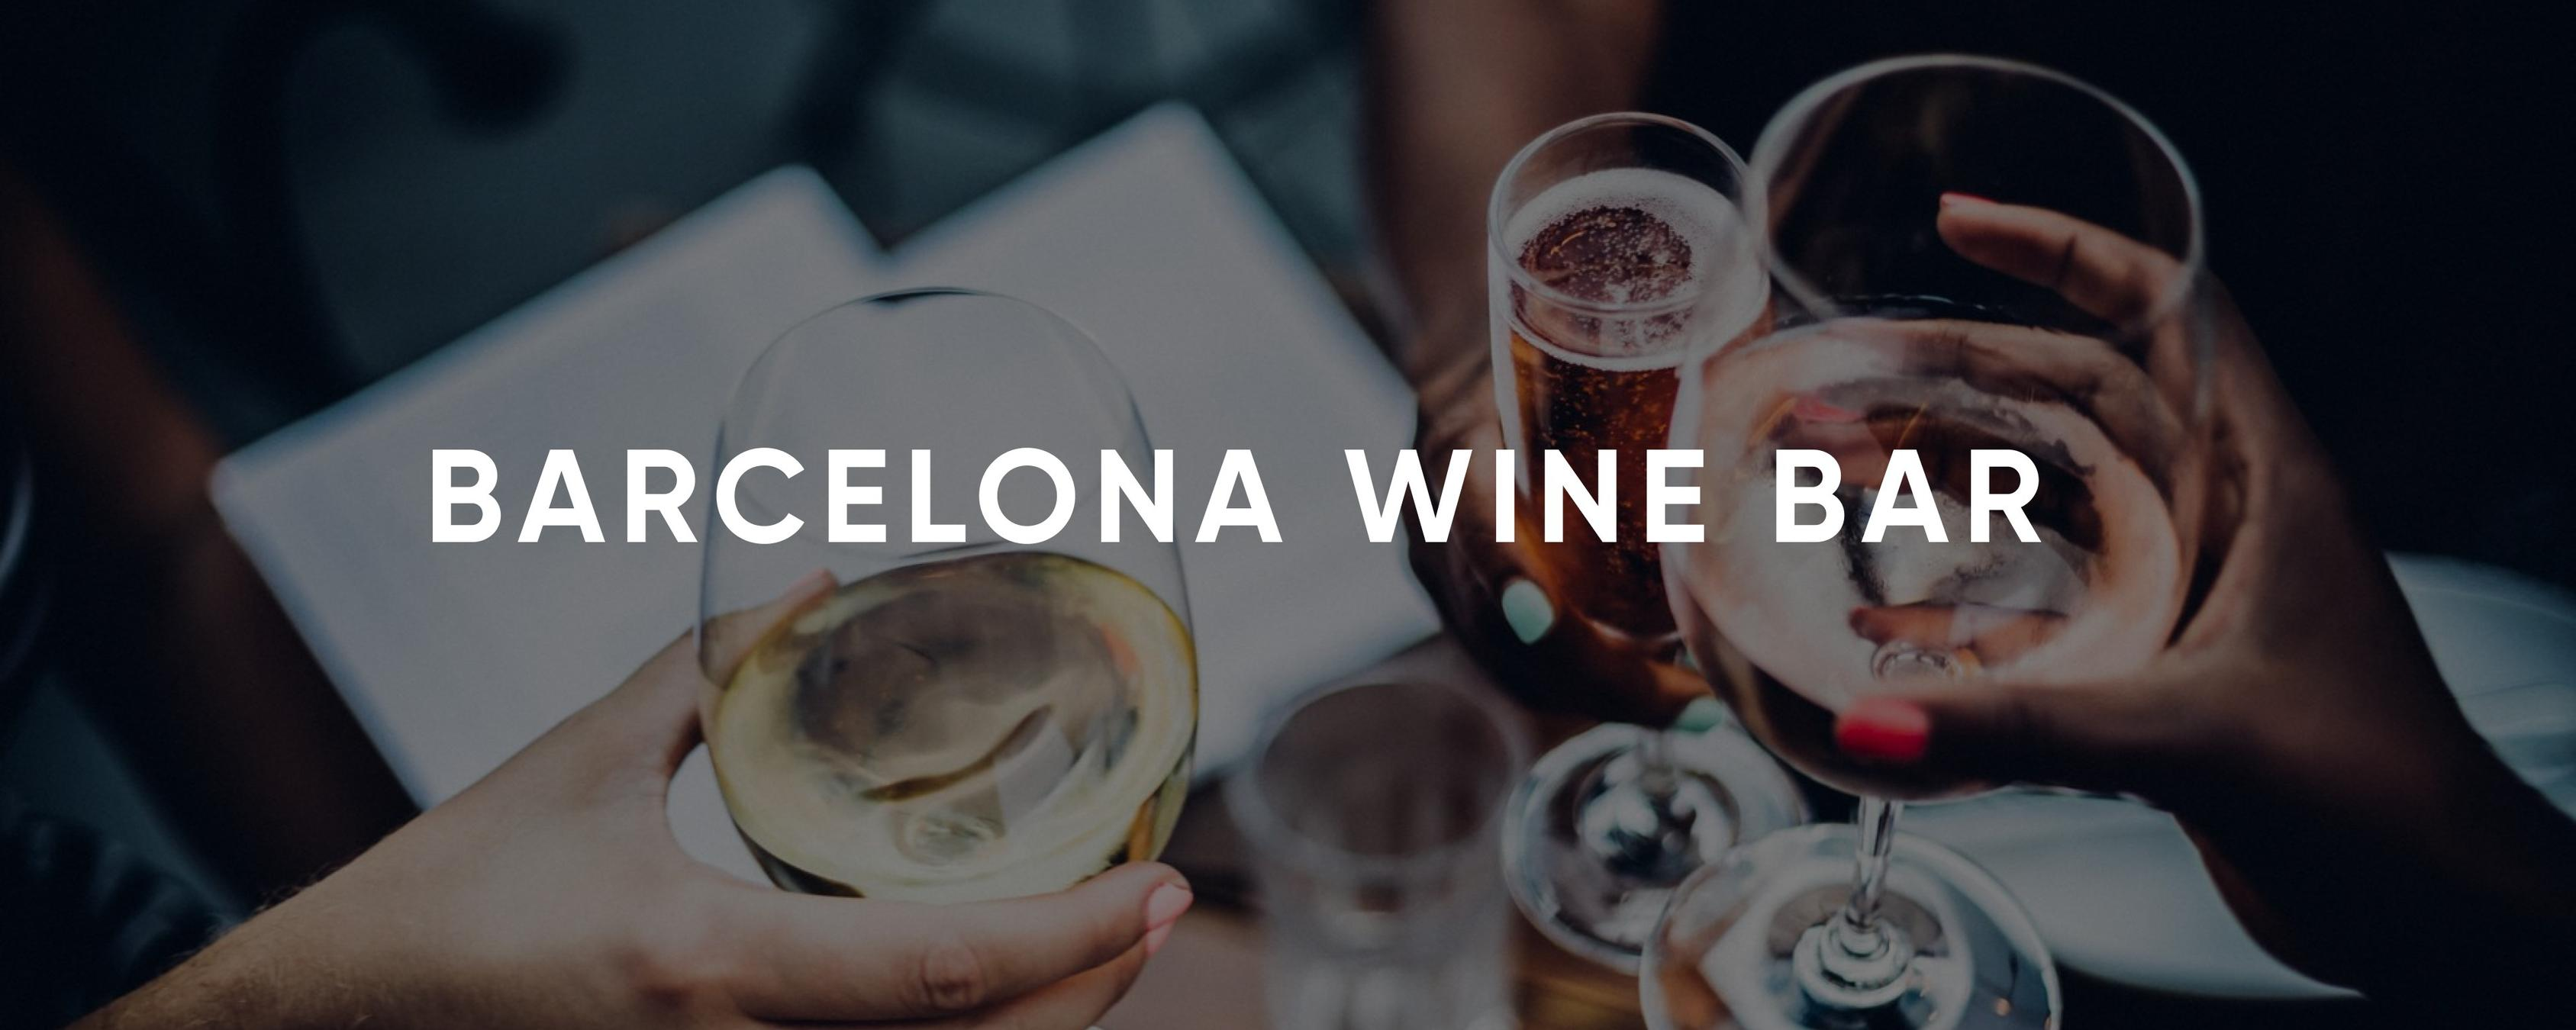 Barcelona Wine Bar Brand Cover